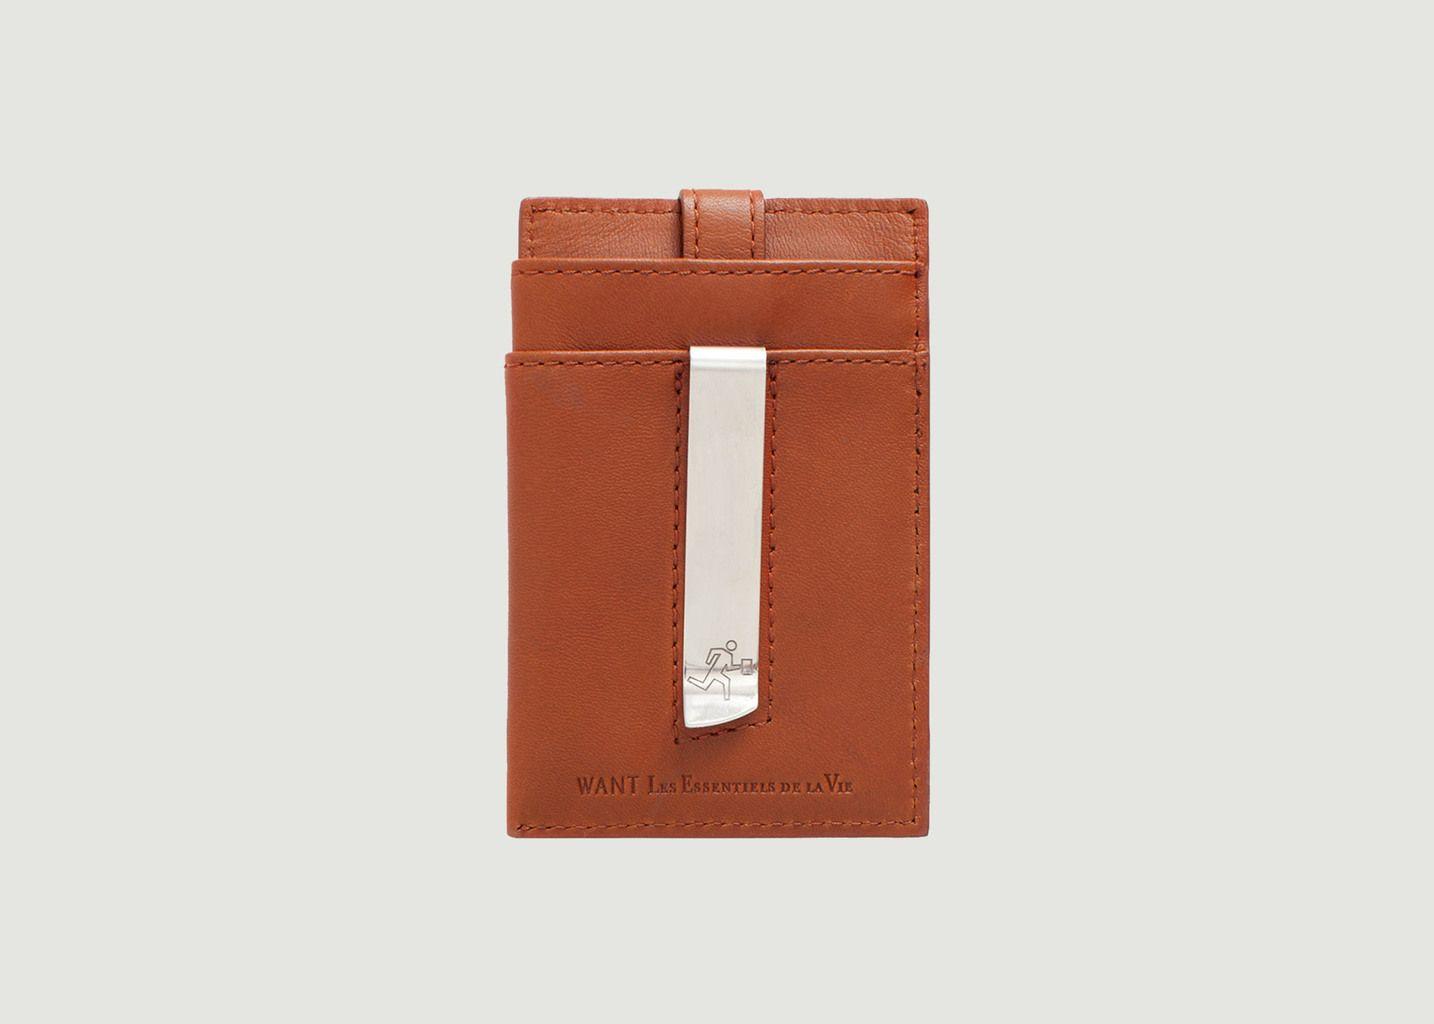 Kennedy Money Clip Wallet  - Want Les Essentiels